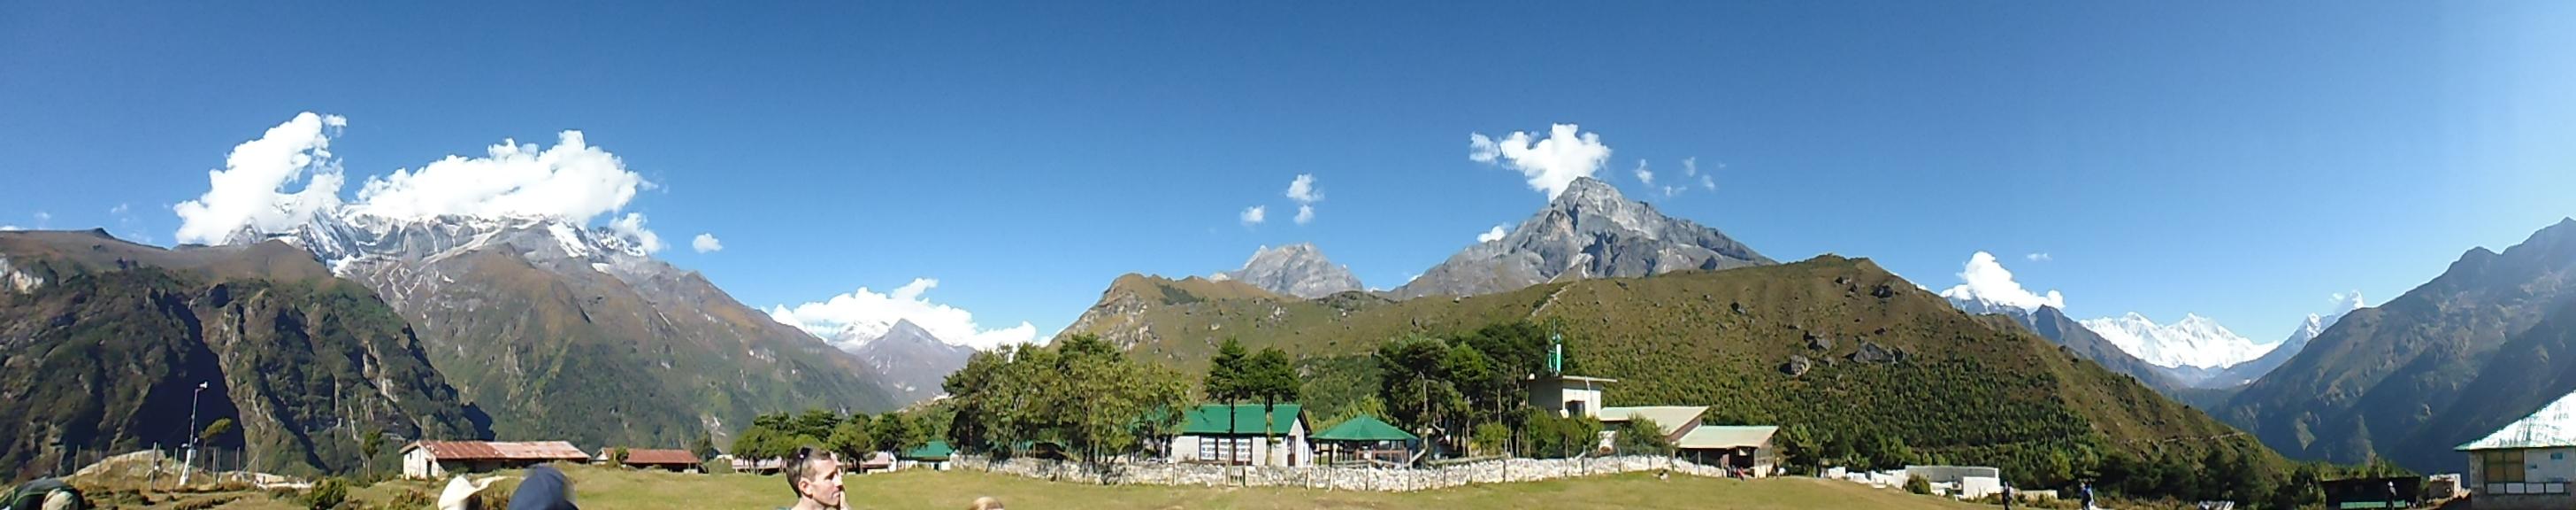 Sherpa Museum Panarama